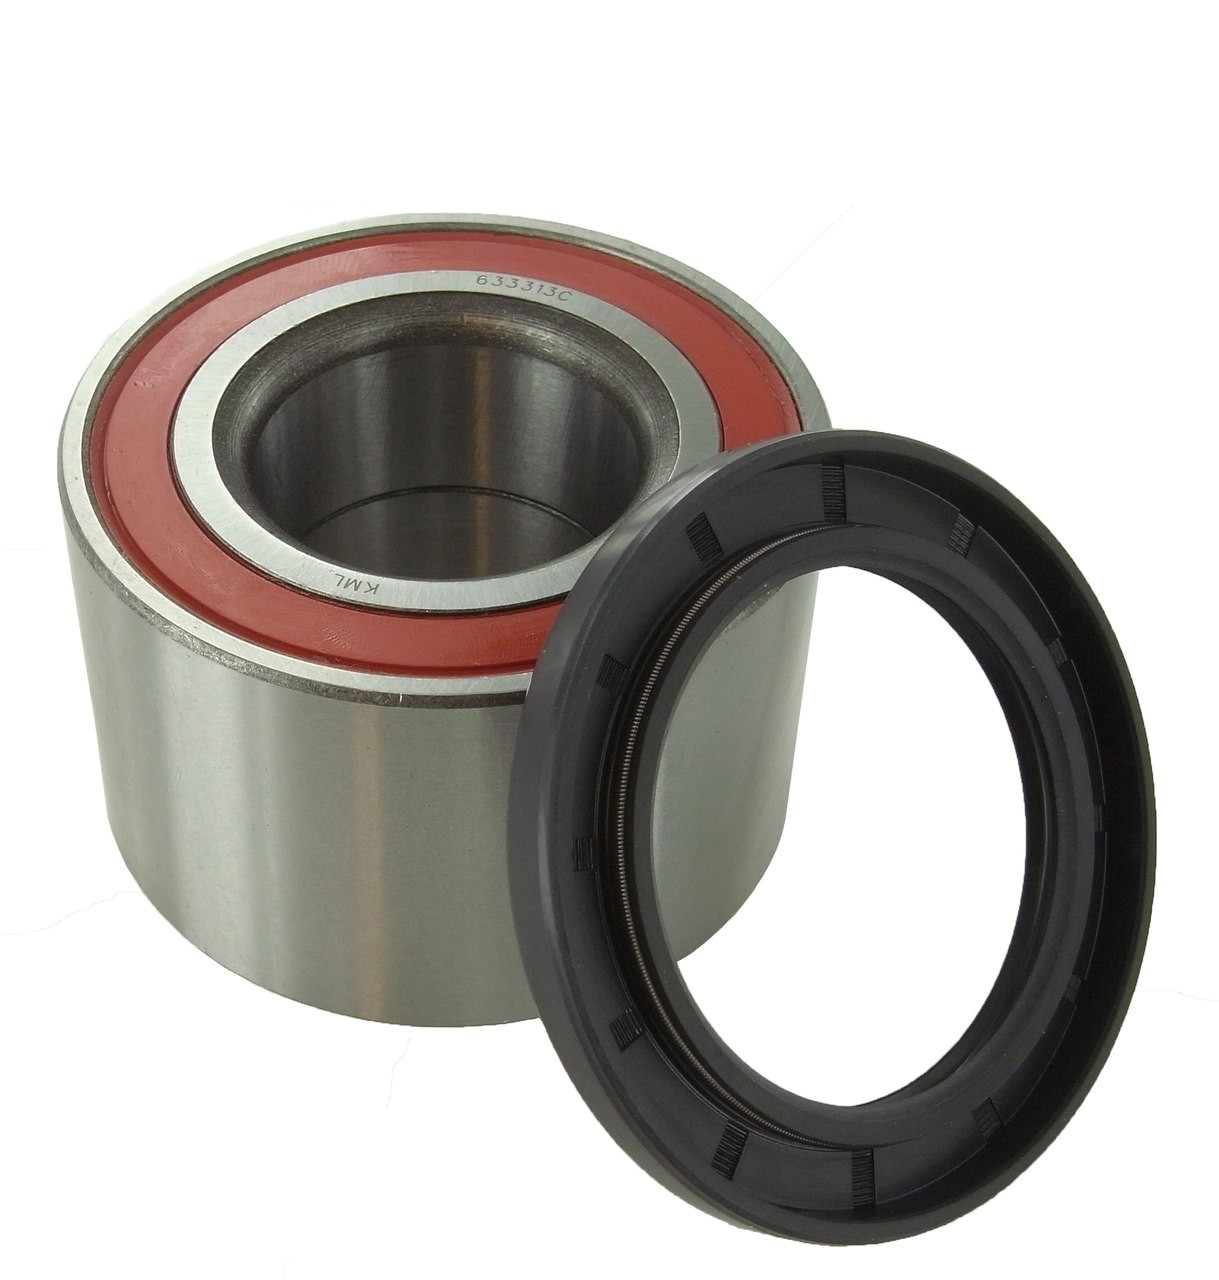 New HQ Powersports Rear Wheel Bearings Can-Am MAVERICK 1000 XMR 1000cc 2015